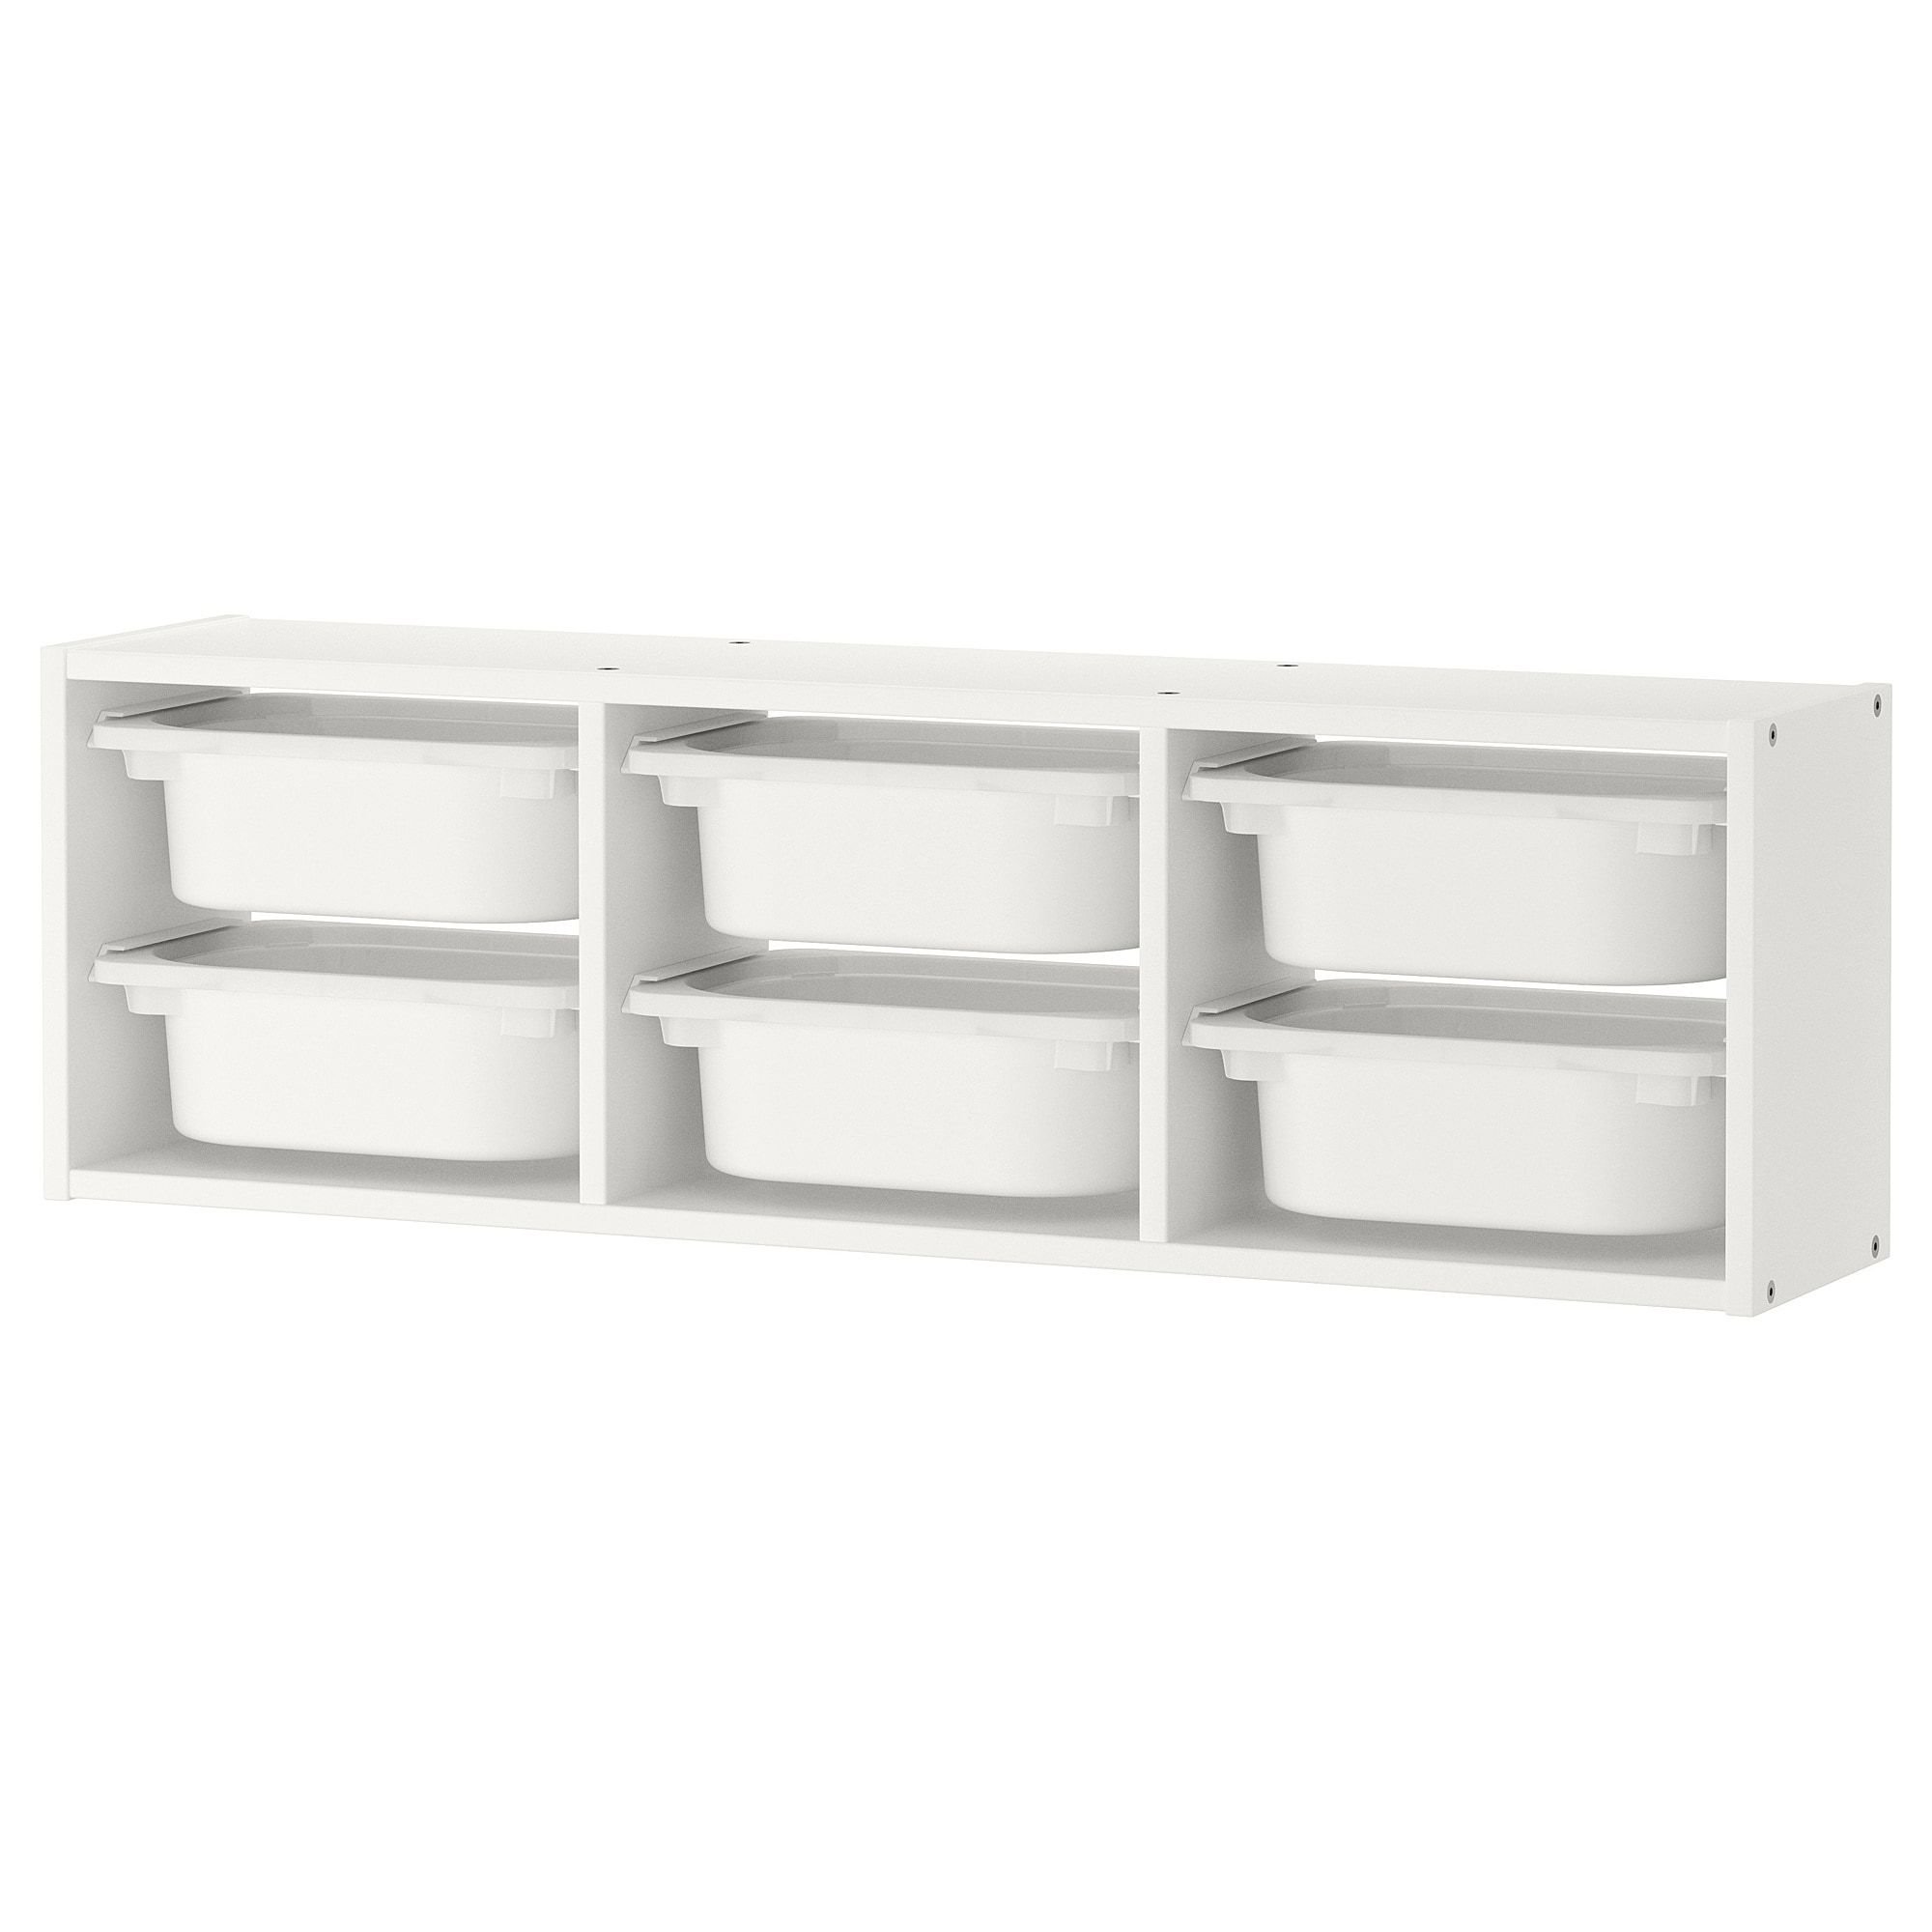 Ikea Trofast White White Wall Storage Wall Storage Kids